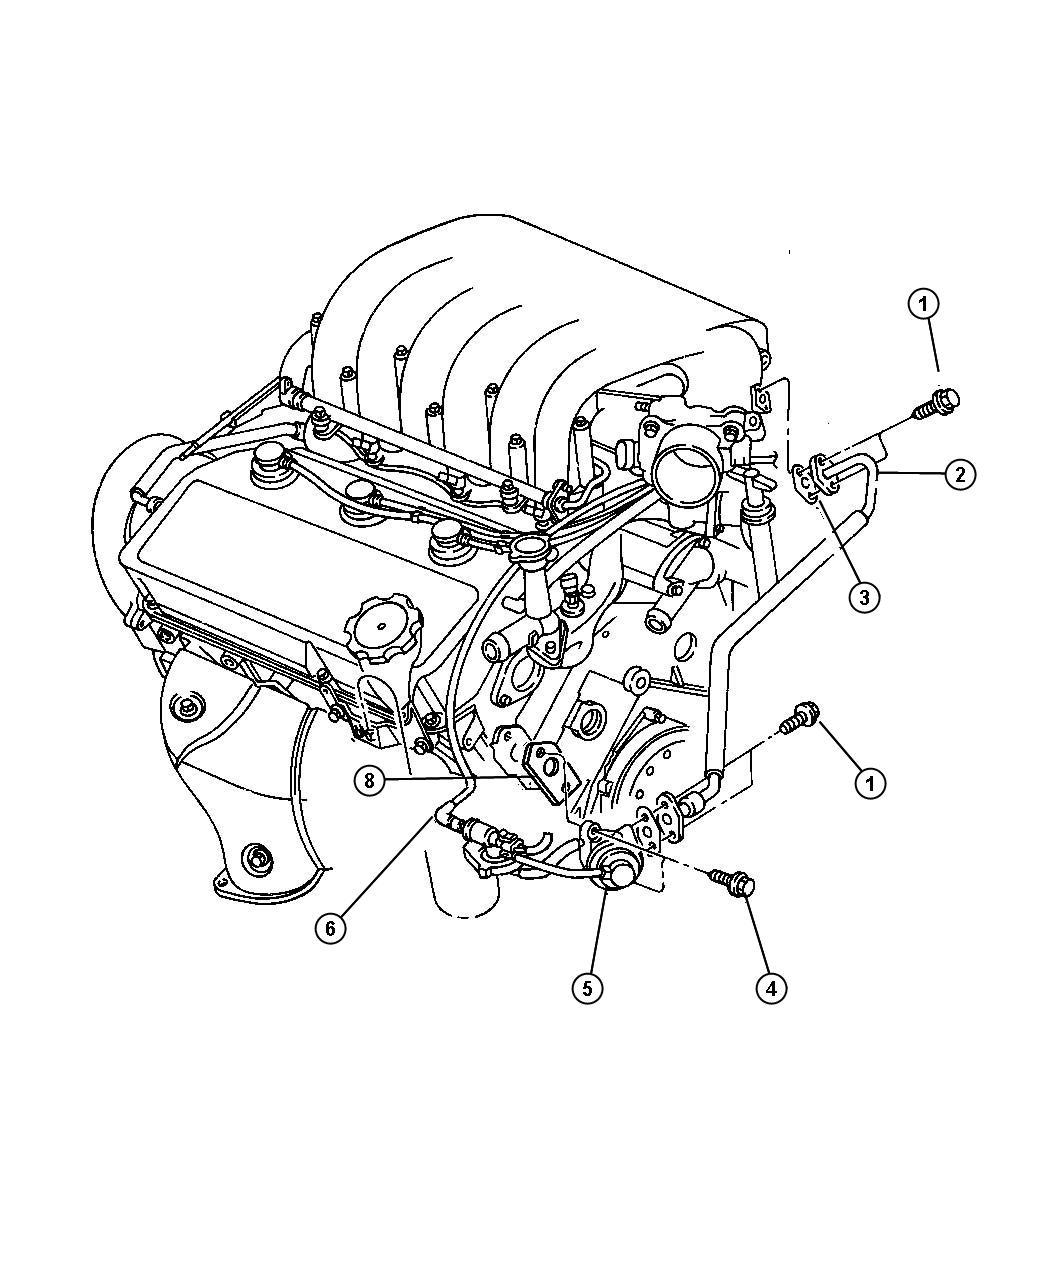 1998 Dodge 2 5l Engine Diagram Stratus. Dodge. Auto Wiring